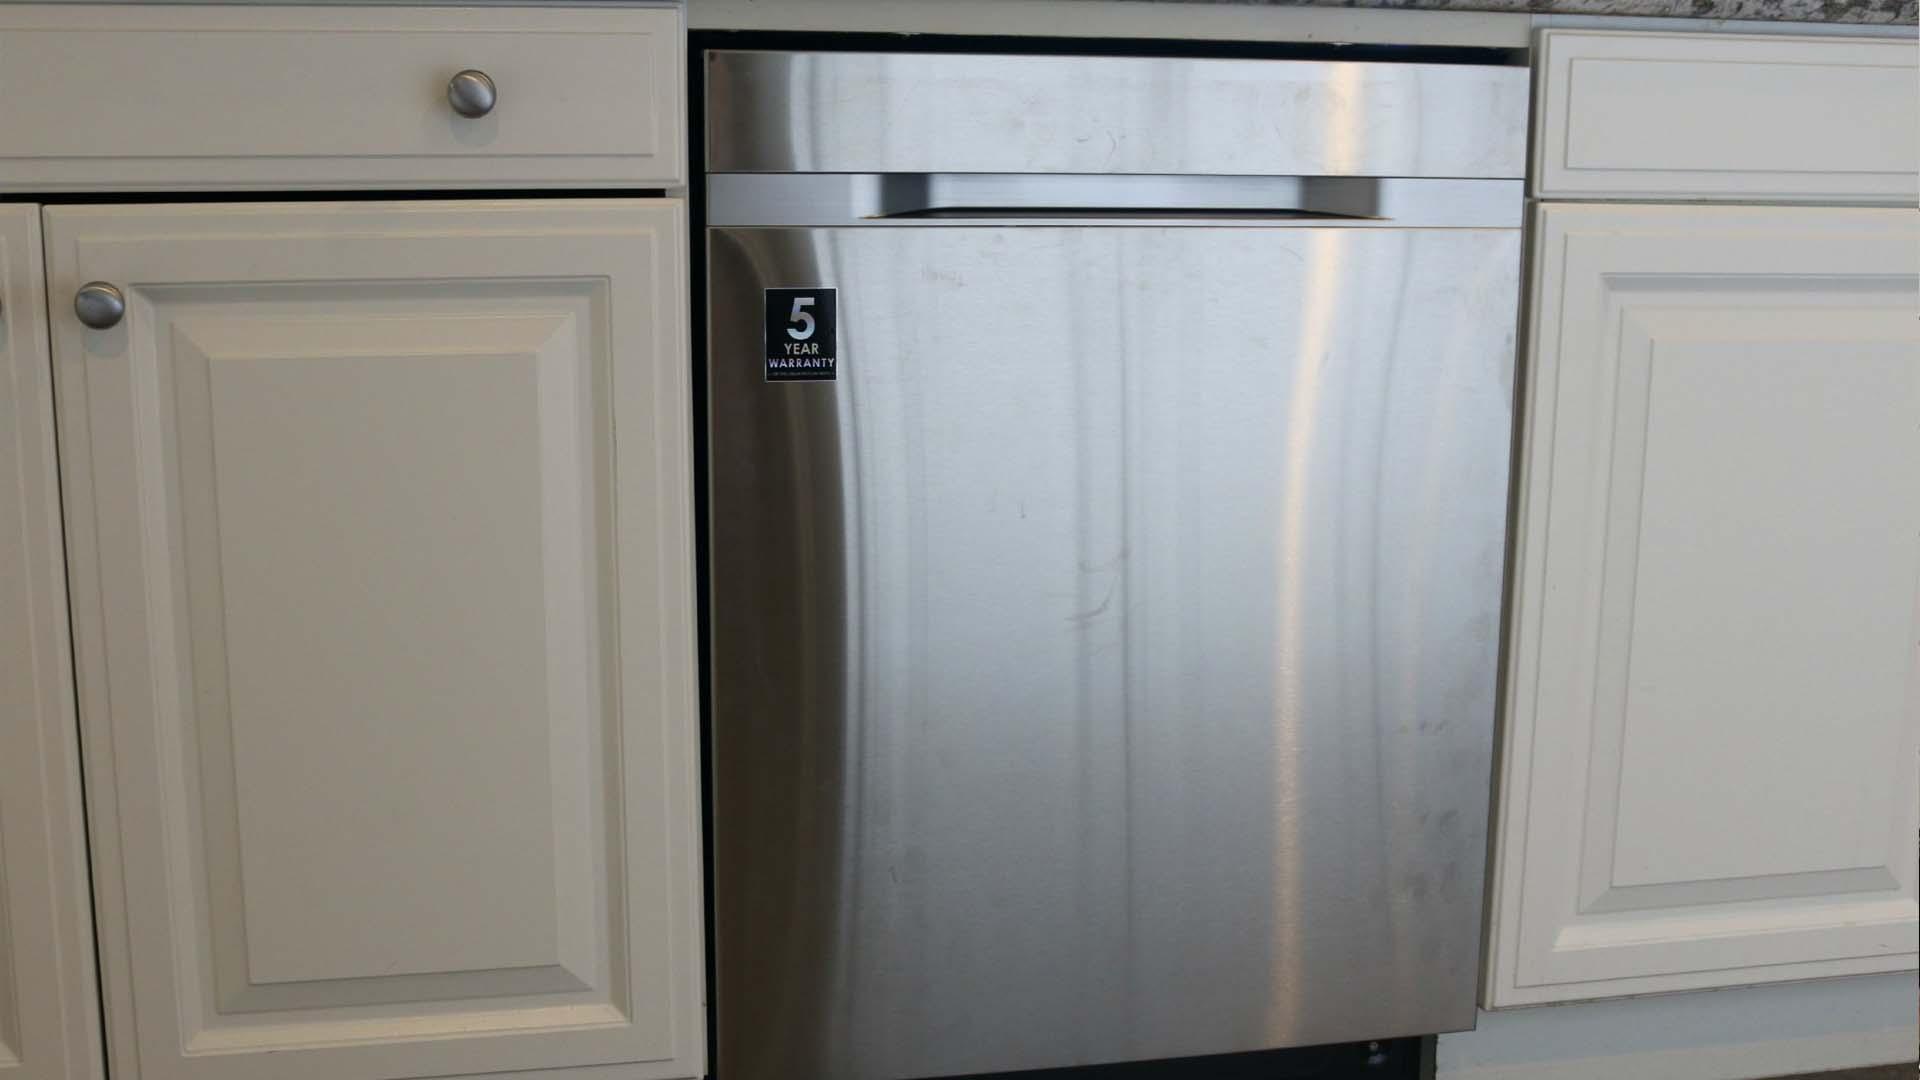 Samsung Rotary Dishwasher Repair Service   Samsung Appliance Repair